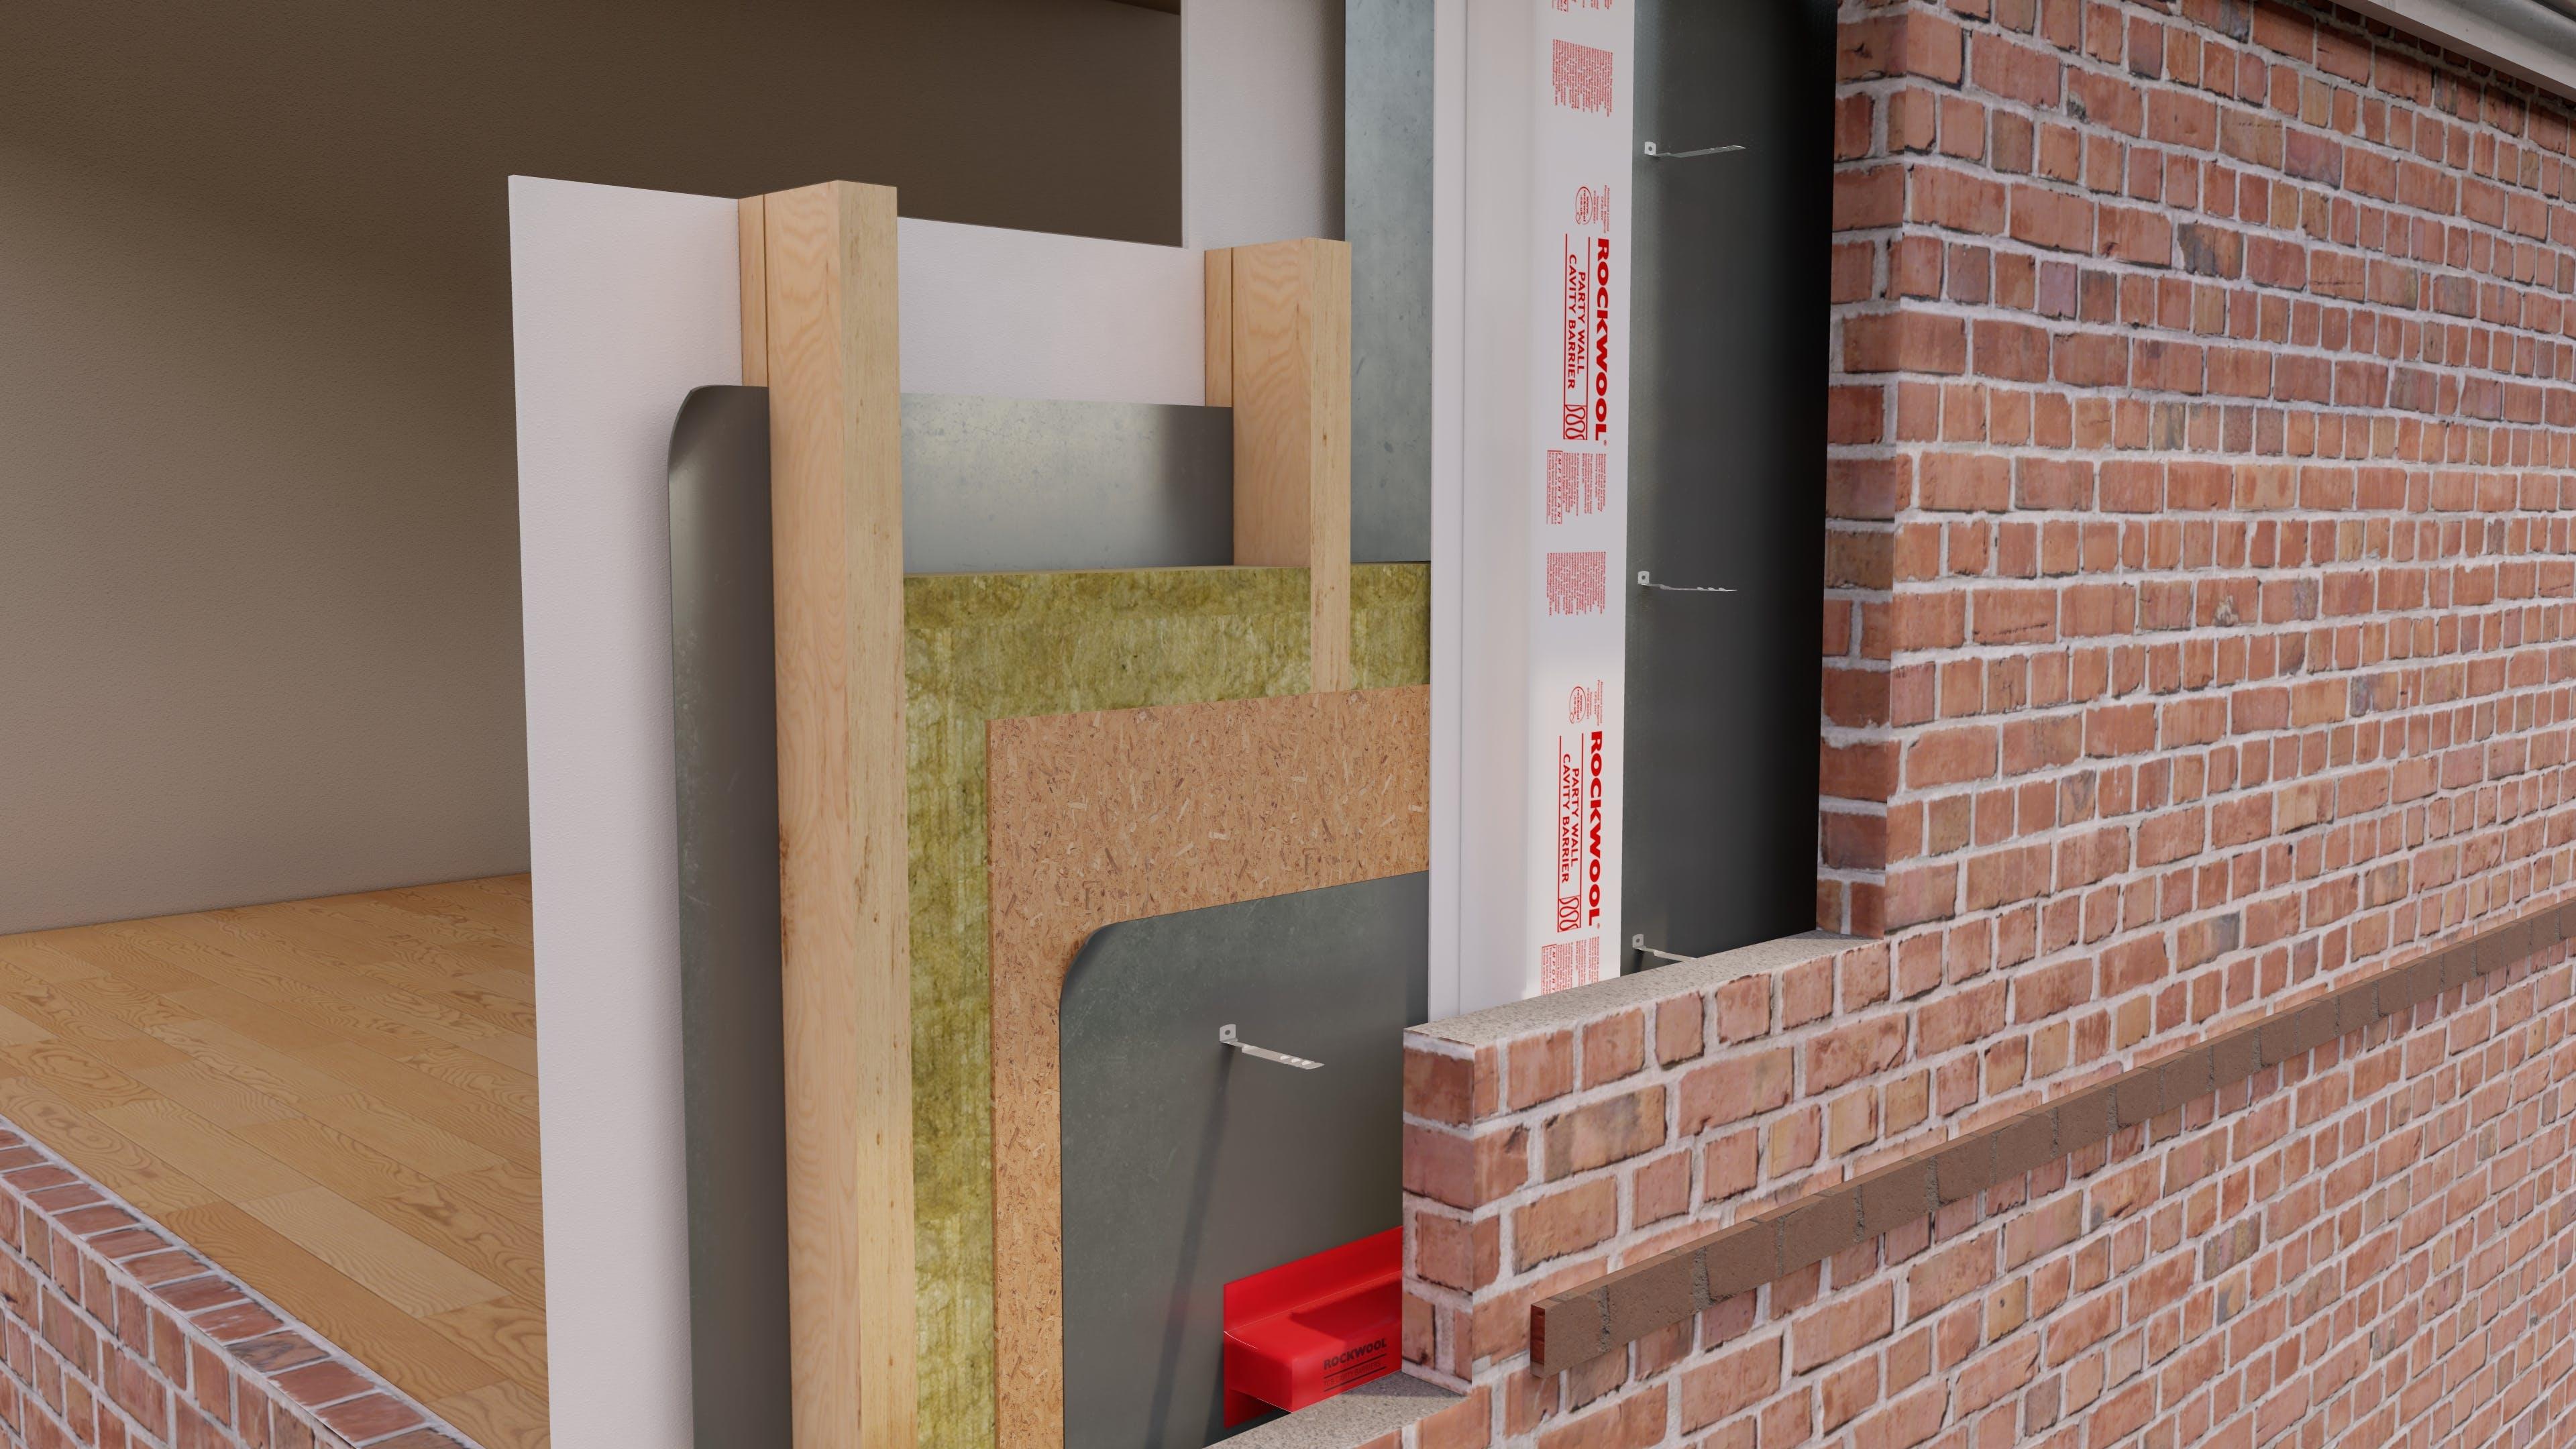 External Wall - Timber Frame  Brick - THERMAL TIMBER FRAME SLAB